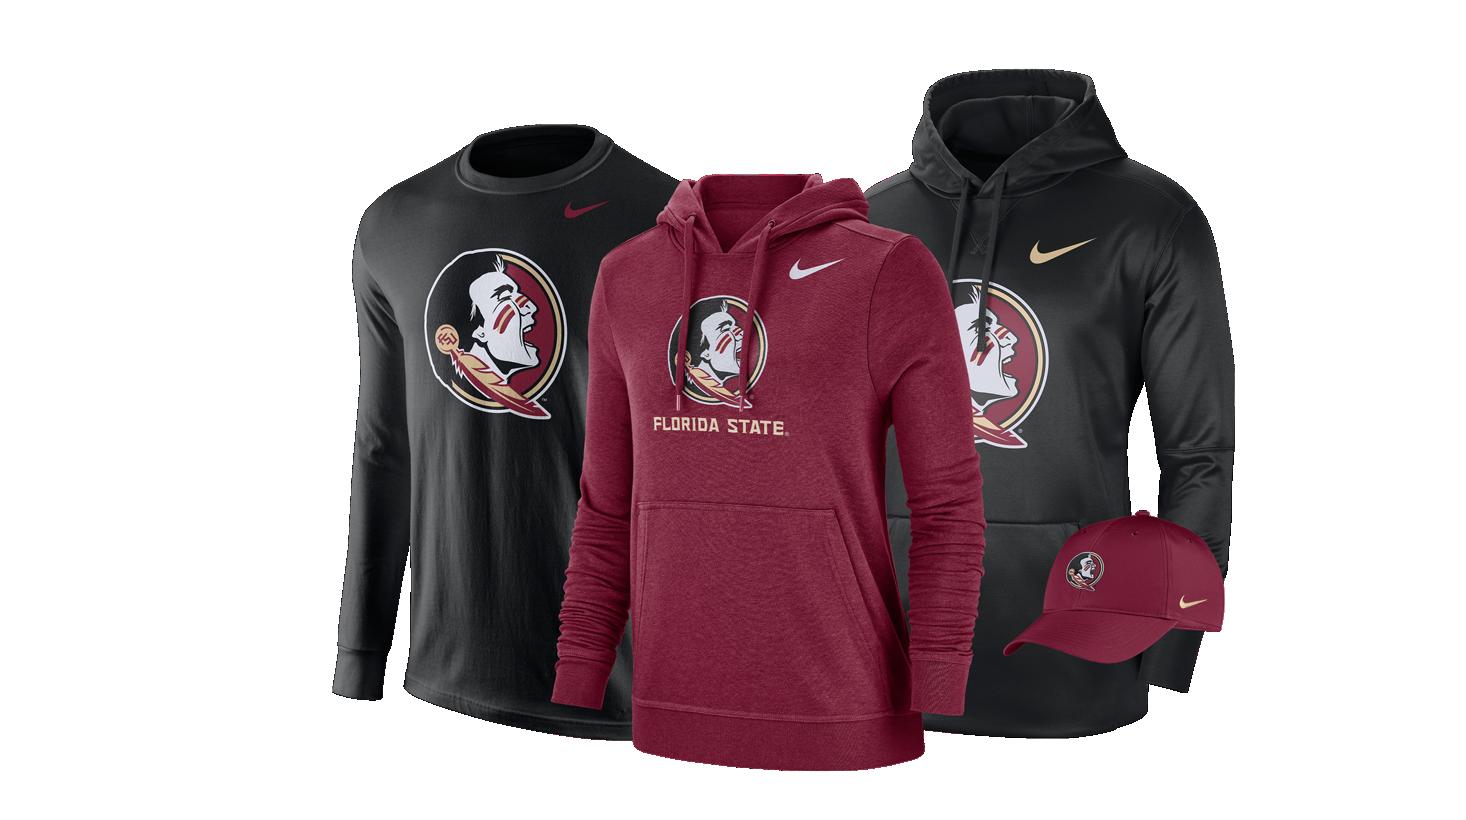 FSU Apparel | Florida State Gear, Merchandise & Gifts